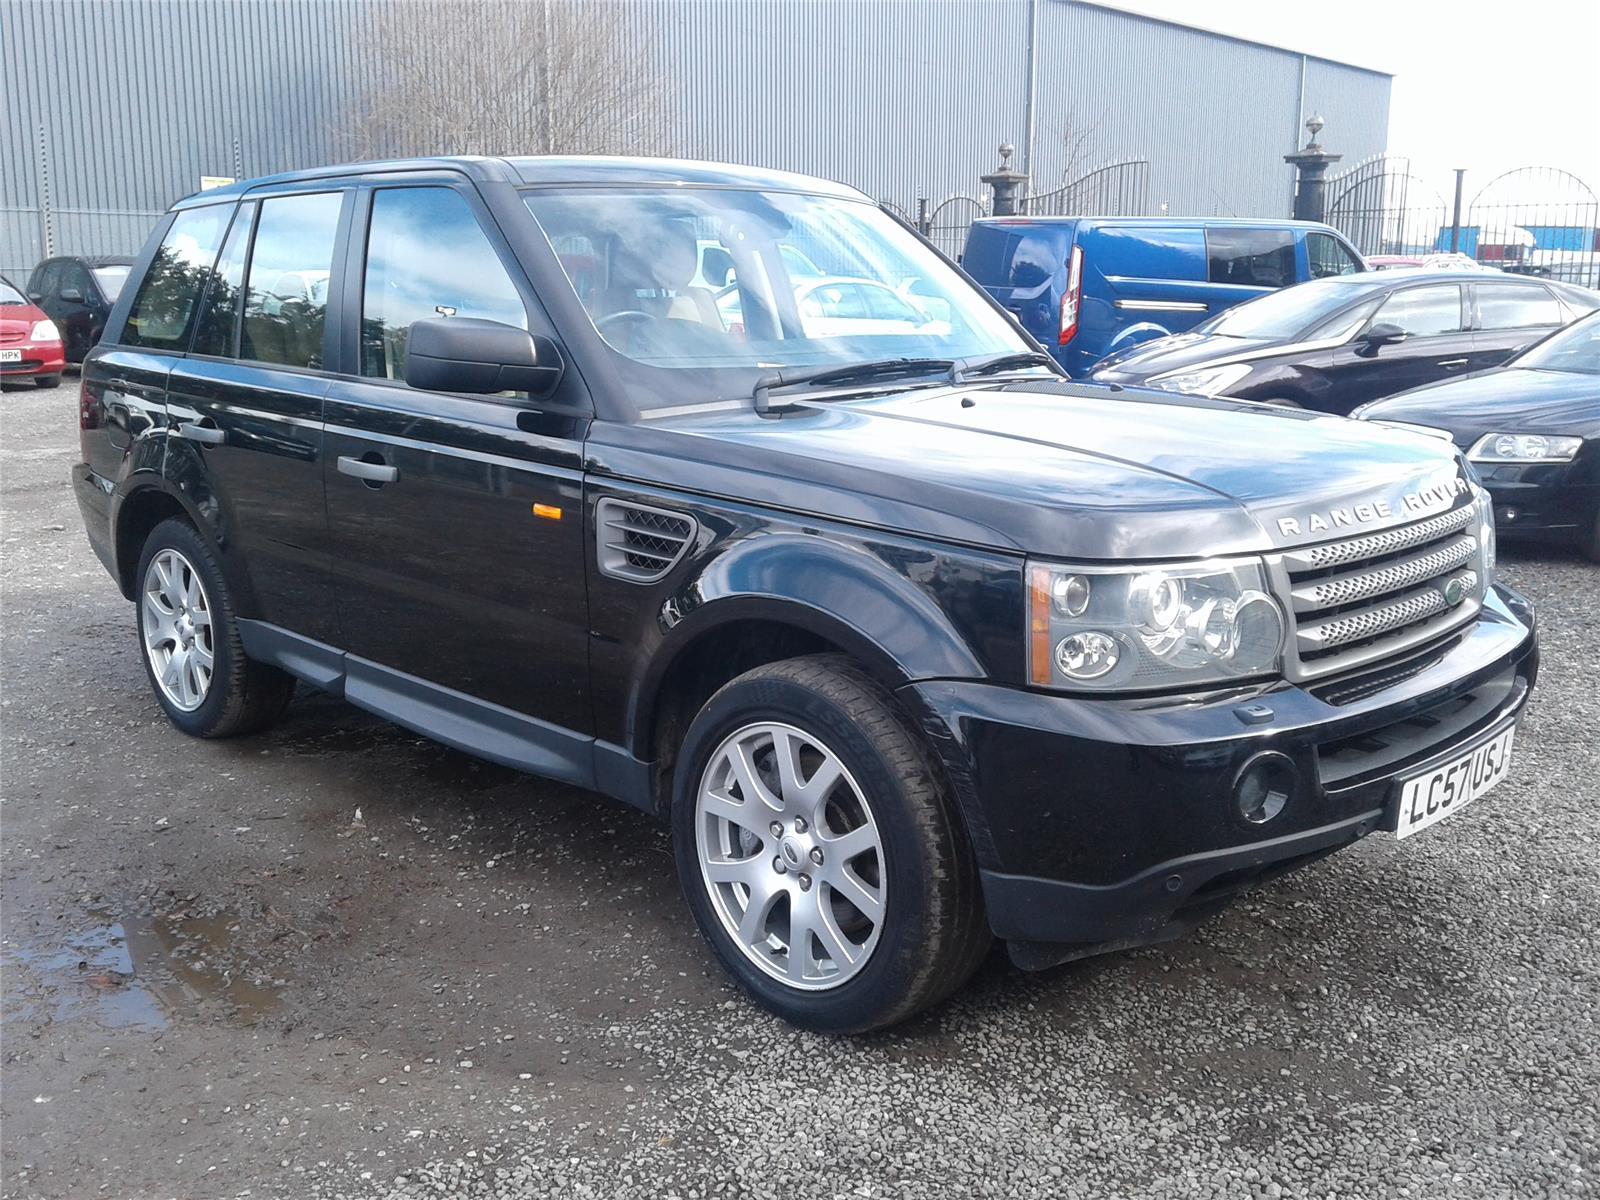 2007 Land Rover Range Rover HSE TD6 2720 Diesel Automatic 6 Speed 5 Door Estate